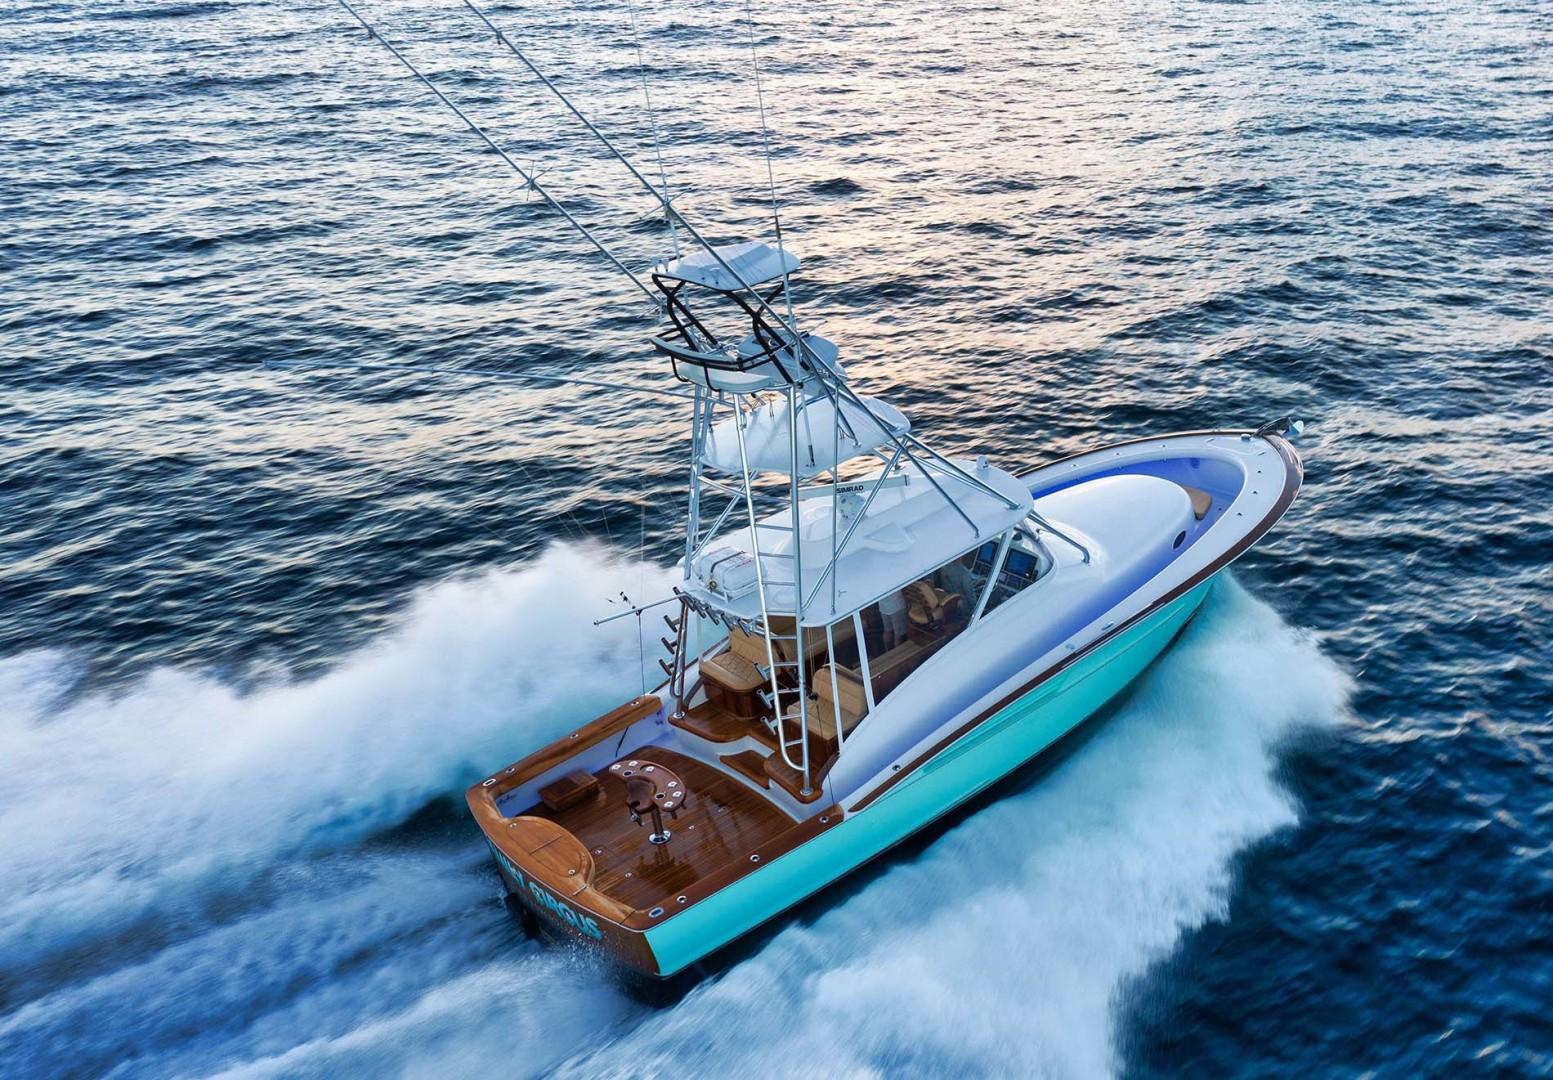 Winter Custom Yachts-46 Walkaround 2019-Family Circus Stuart-Florida-United States-Main Profile-1563725 | Thumbnail